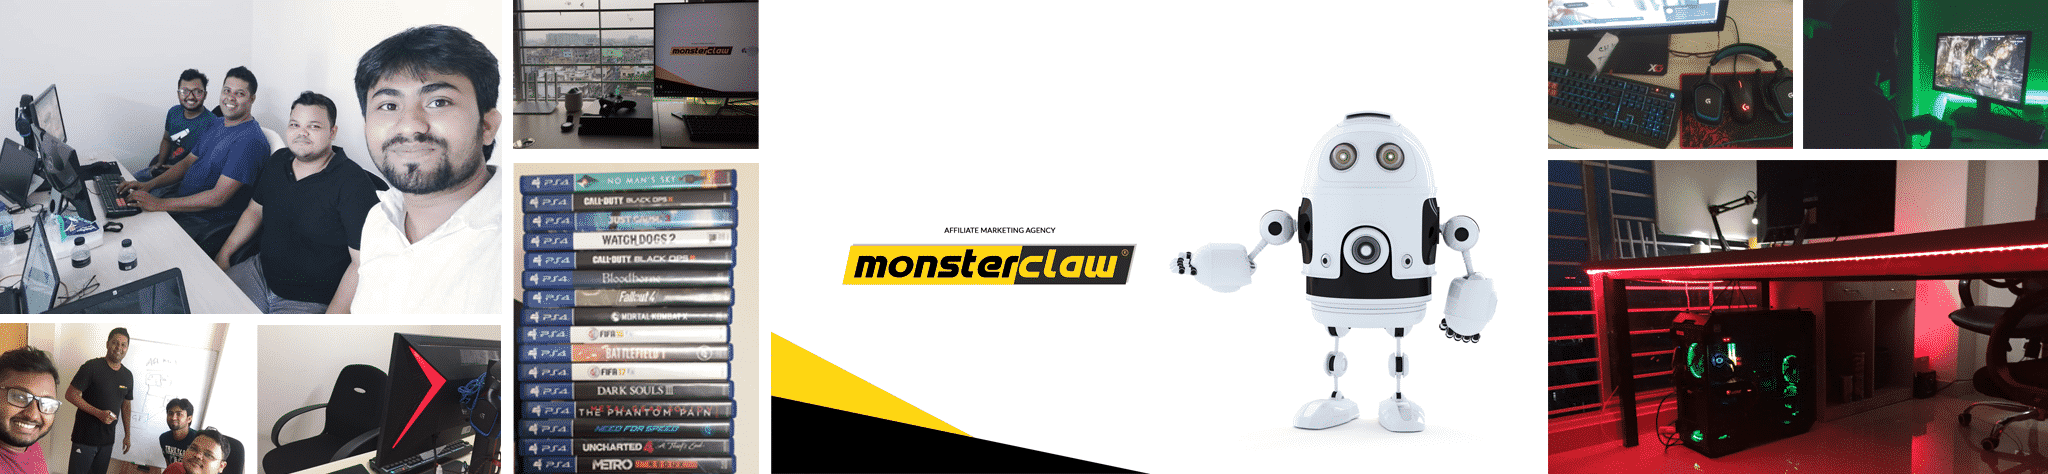 Monsterclaw Team